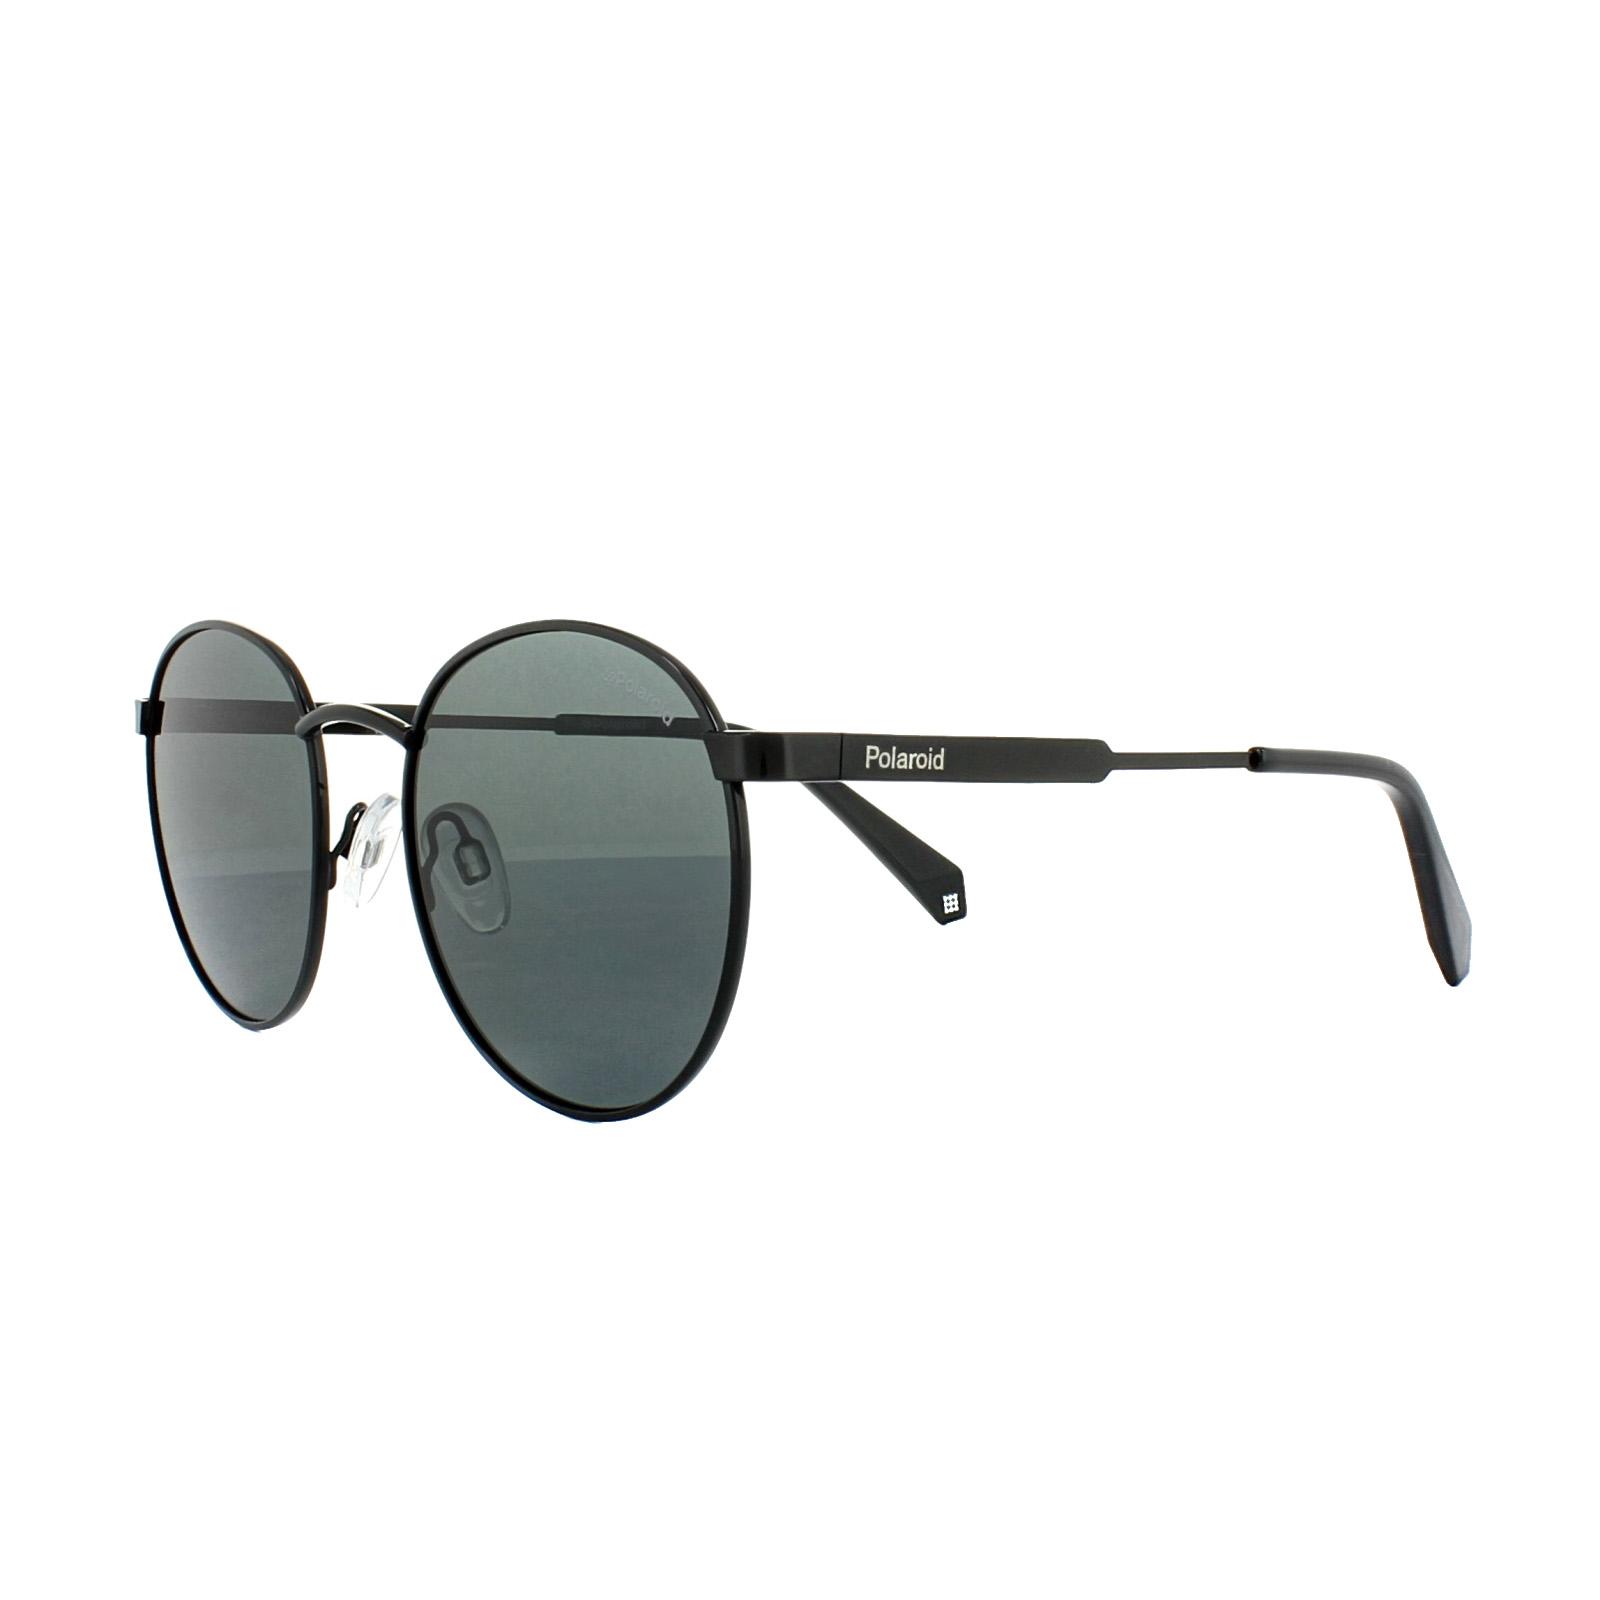 f285a34371 Cheap Polaroid PLD 2053 S Sunglasses - Discounted Sunglasses